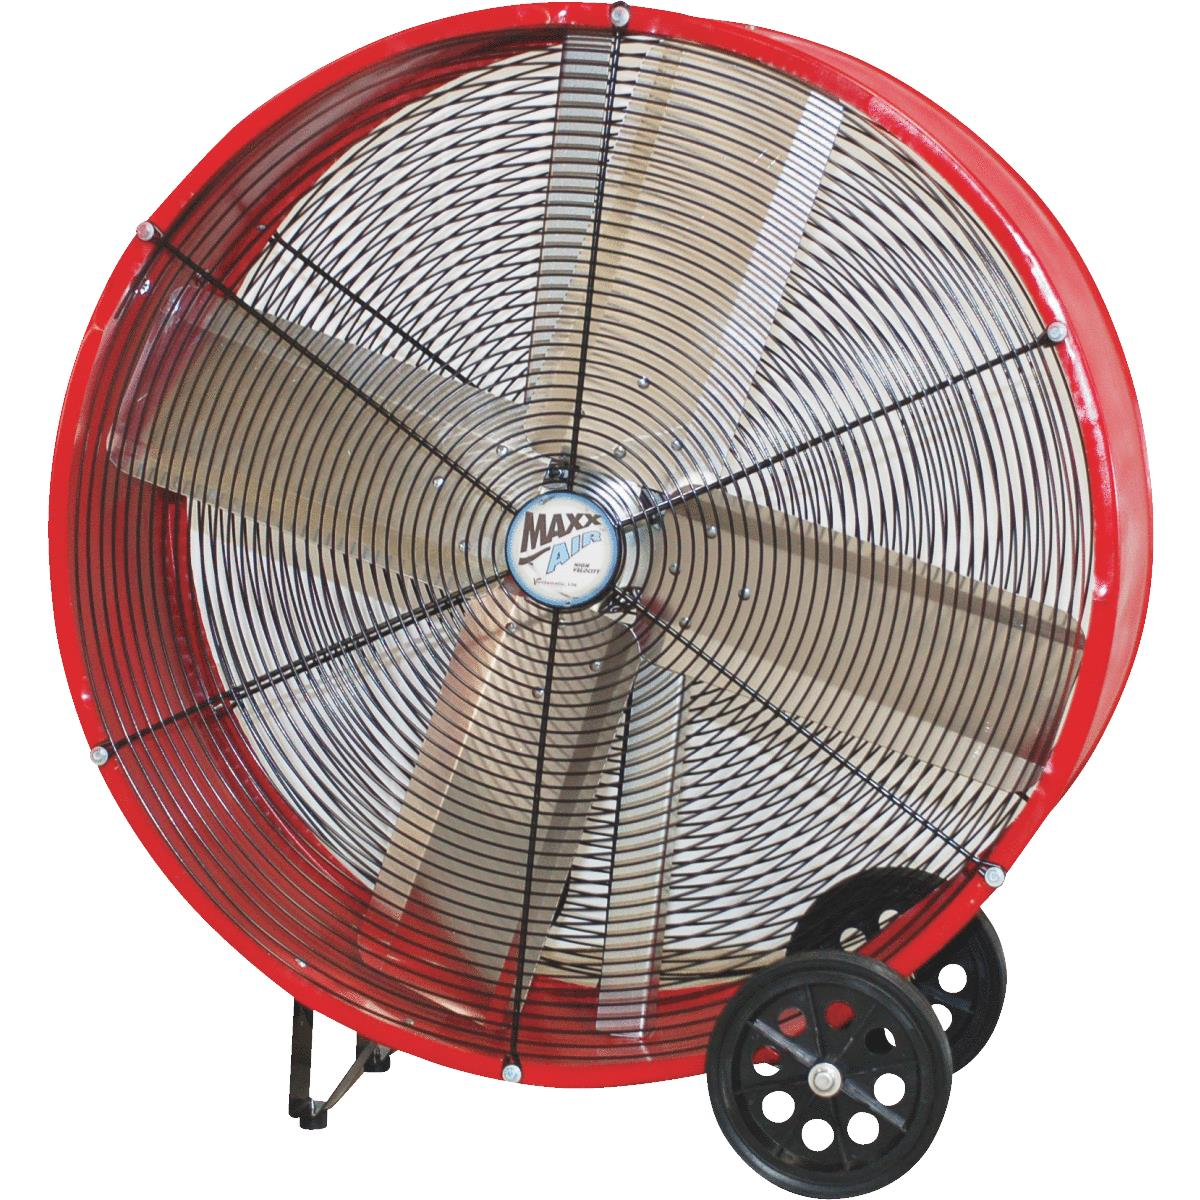 Ventamatic Maxx Air Direct Drive Drum Fan